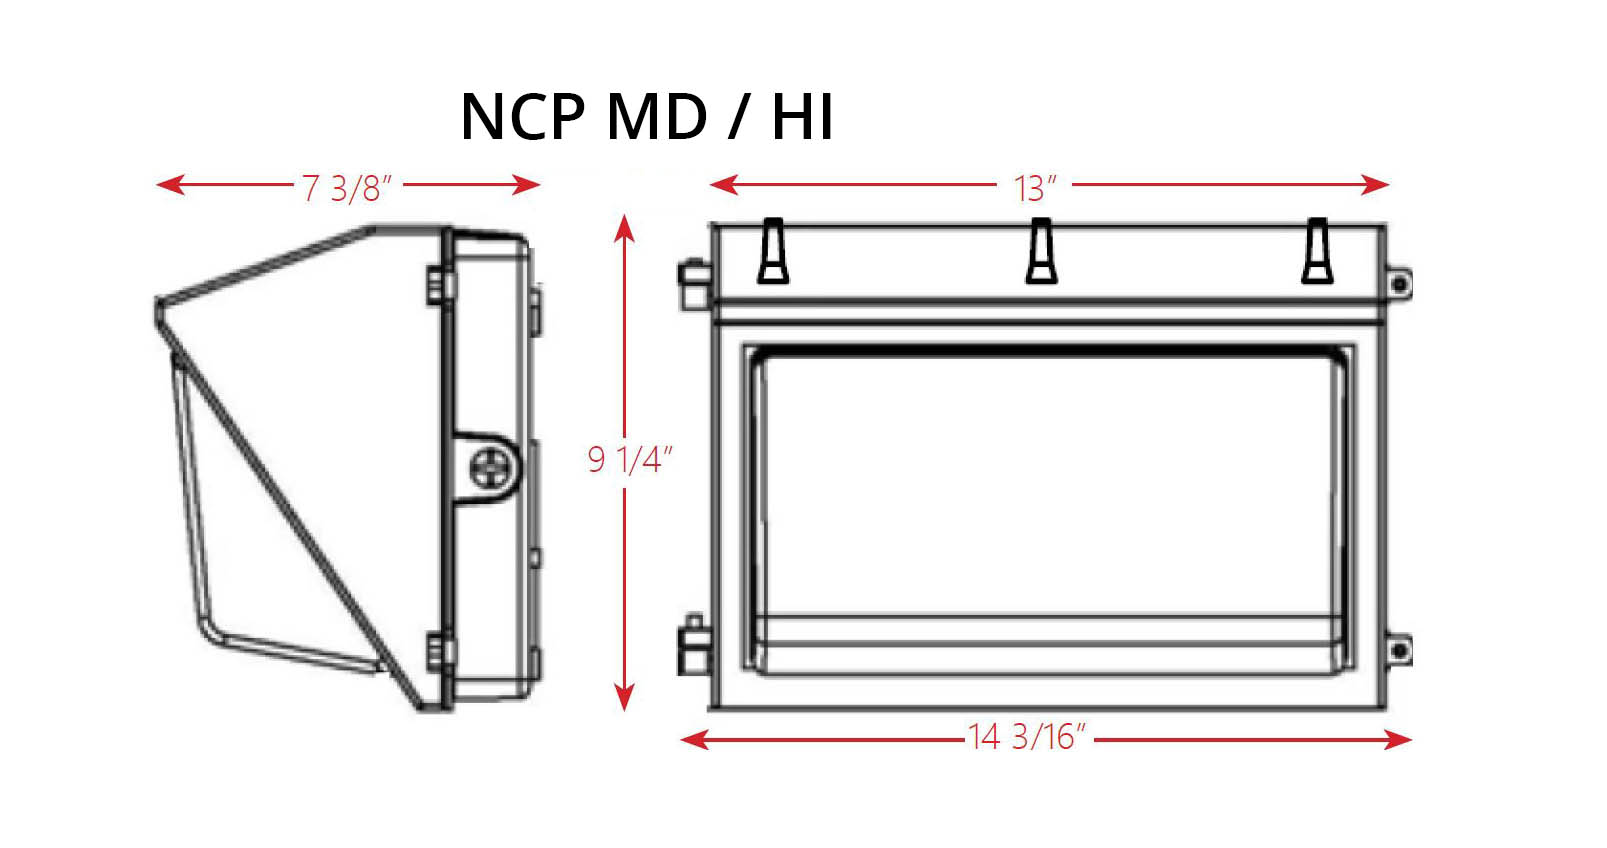 https://unamilighting.com/wp-content/uploads/2018/04/NCP-MD-HI-schematic.jpg